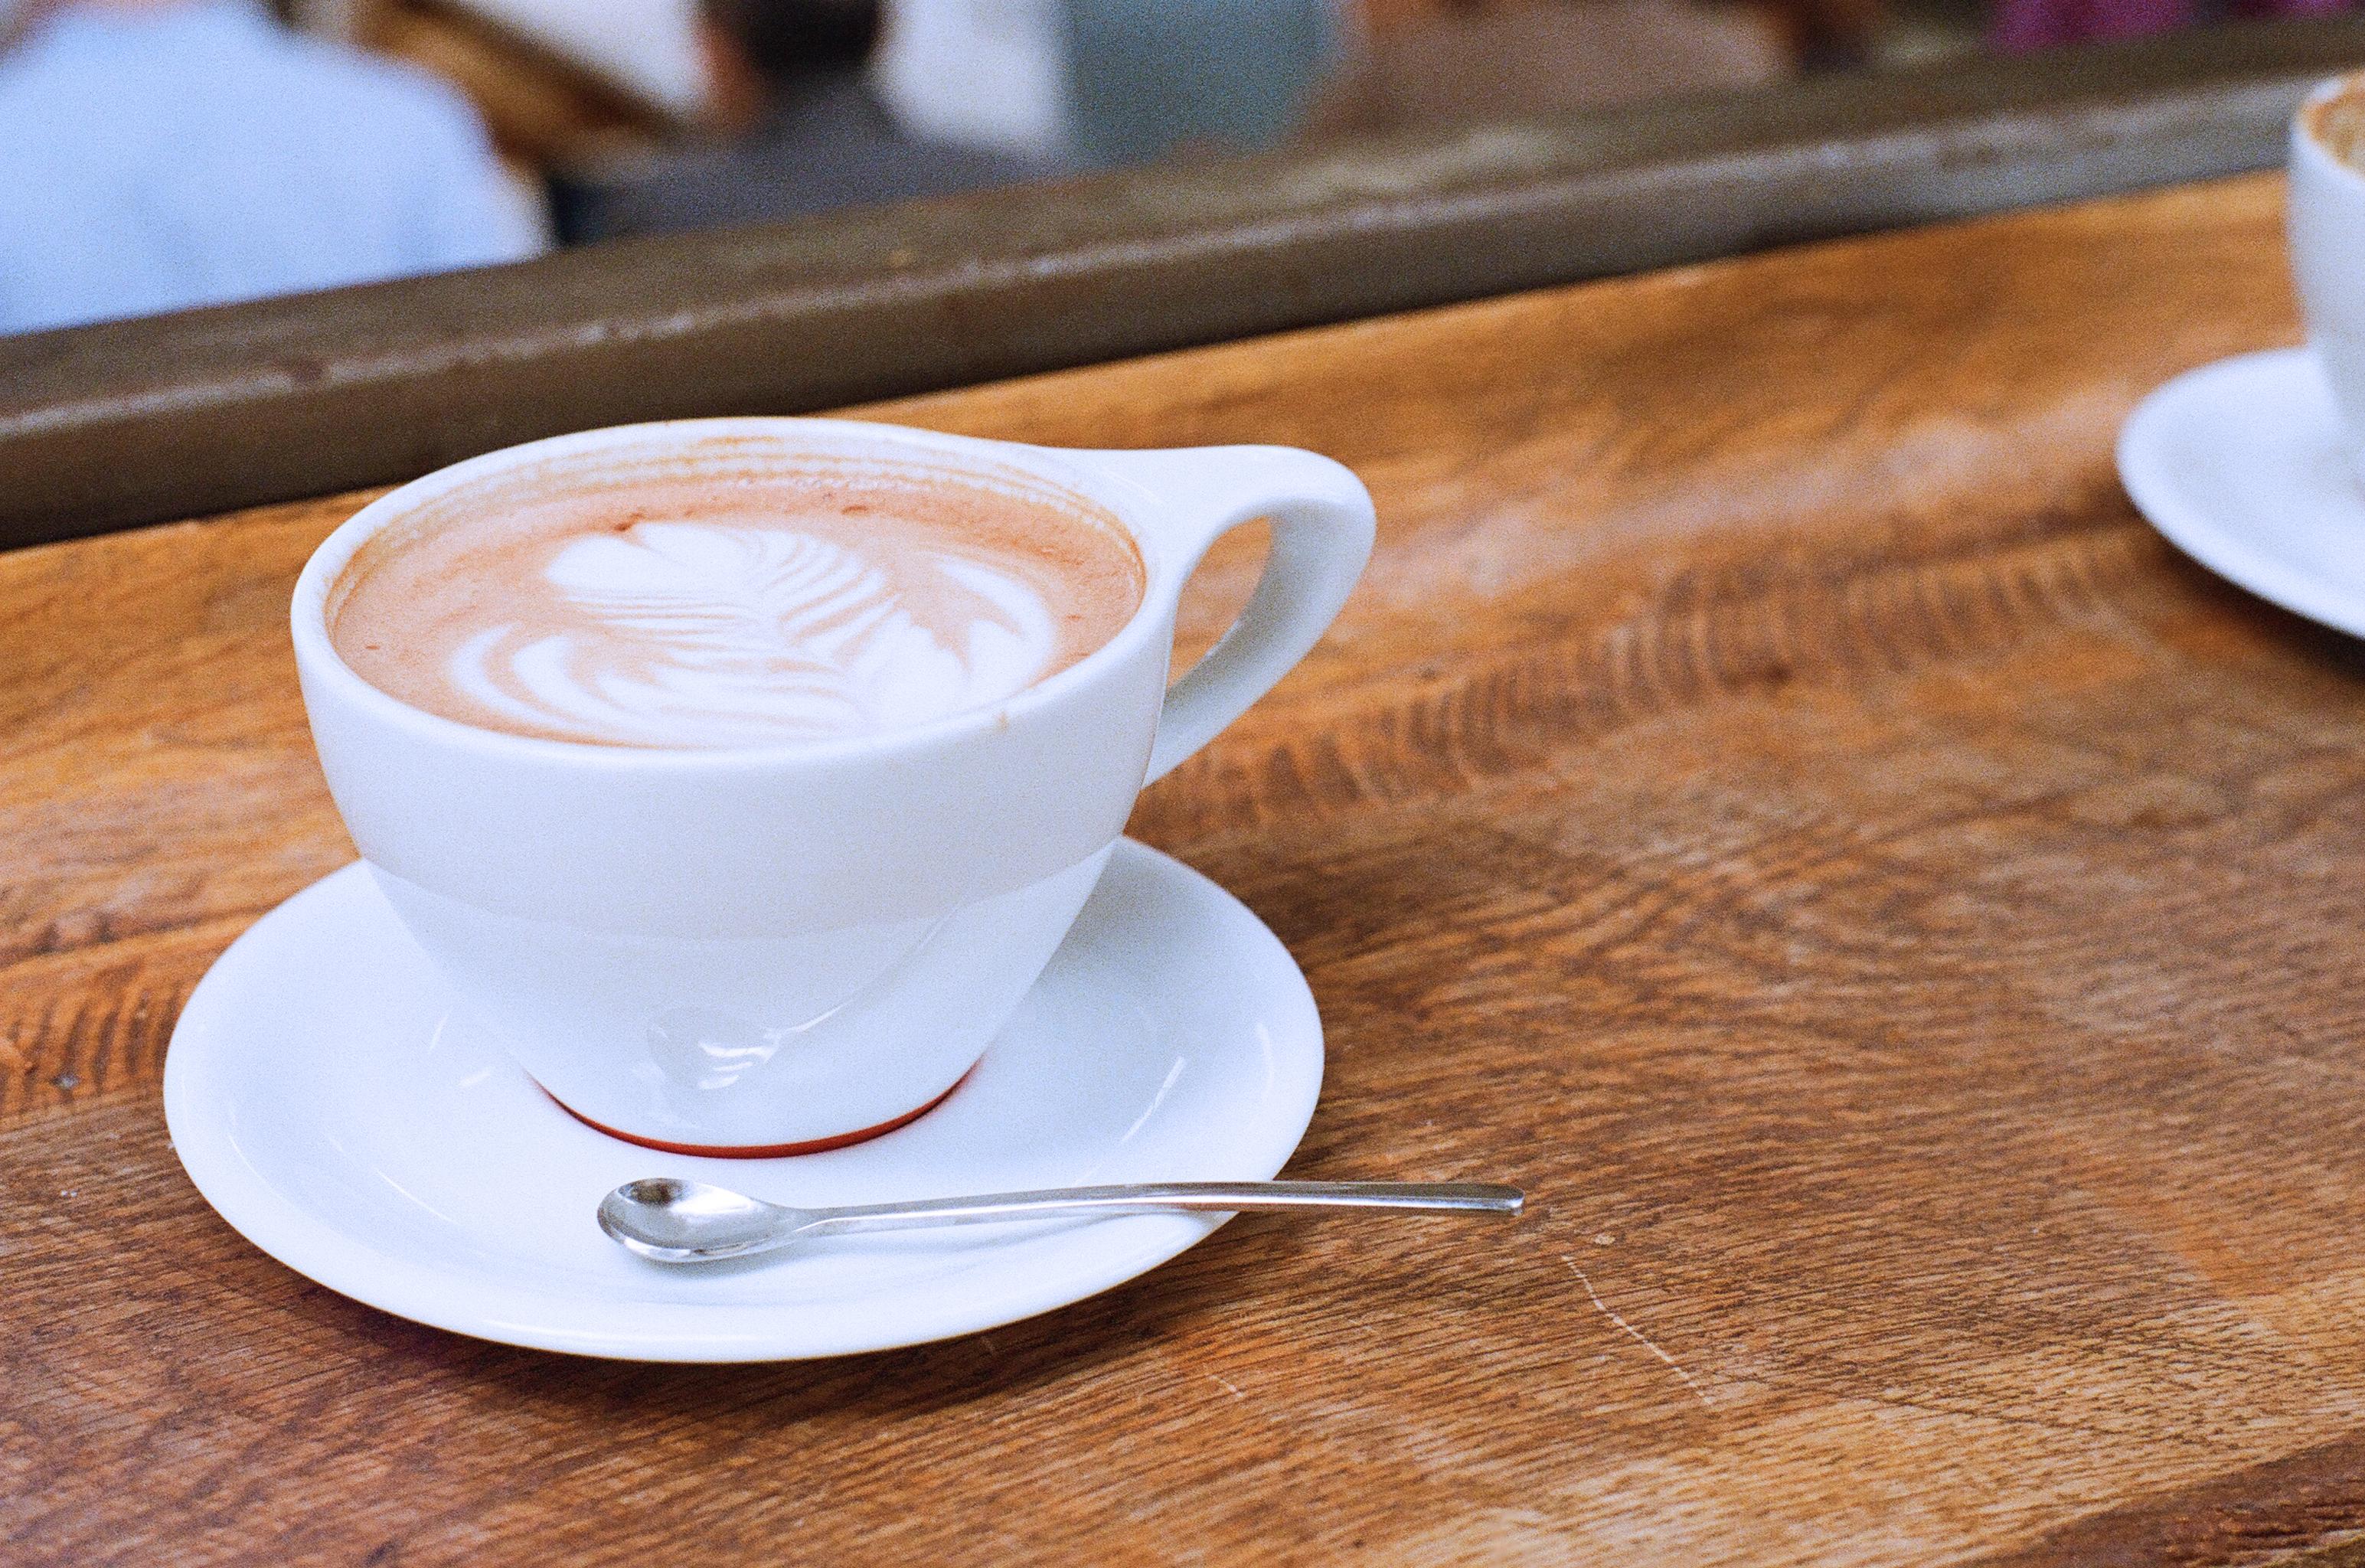 https://static.pexels.com/photos/2709/restaurant-coffee-cup-cappuccino.jpg